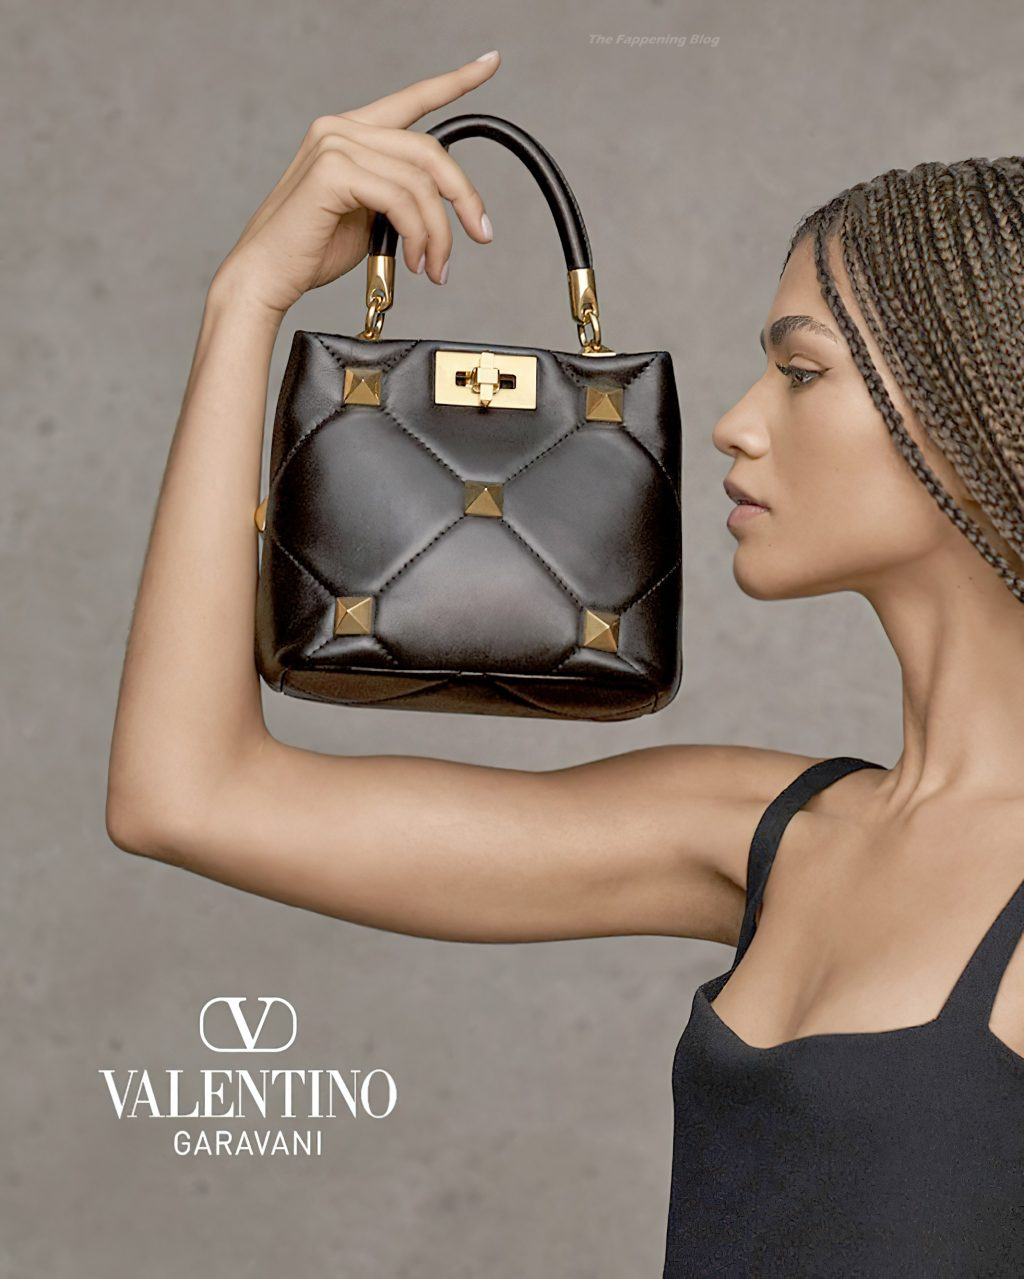 Zendaya Poses for Valentino's Handbag Campaign (5 Sexy Photos)